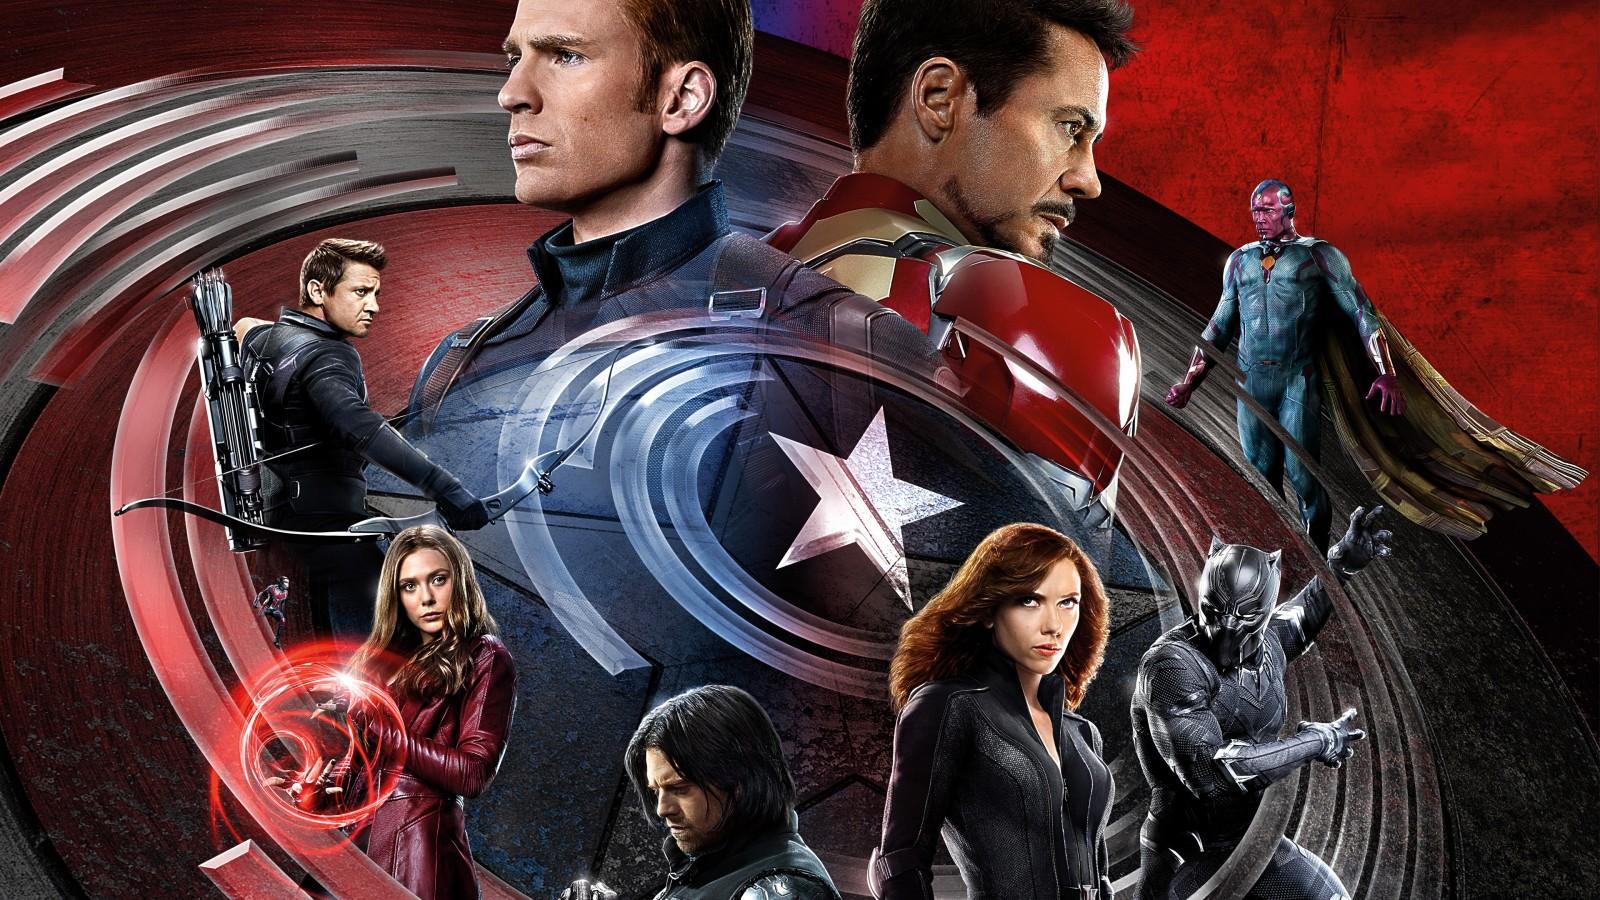 Iron Man 3d Wallpaper Android Civil War Captain America Iron Man Wallpapers Hd